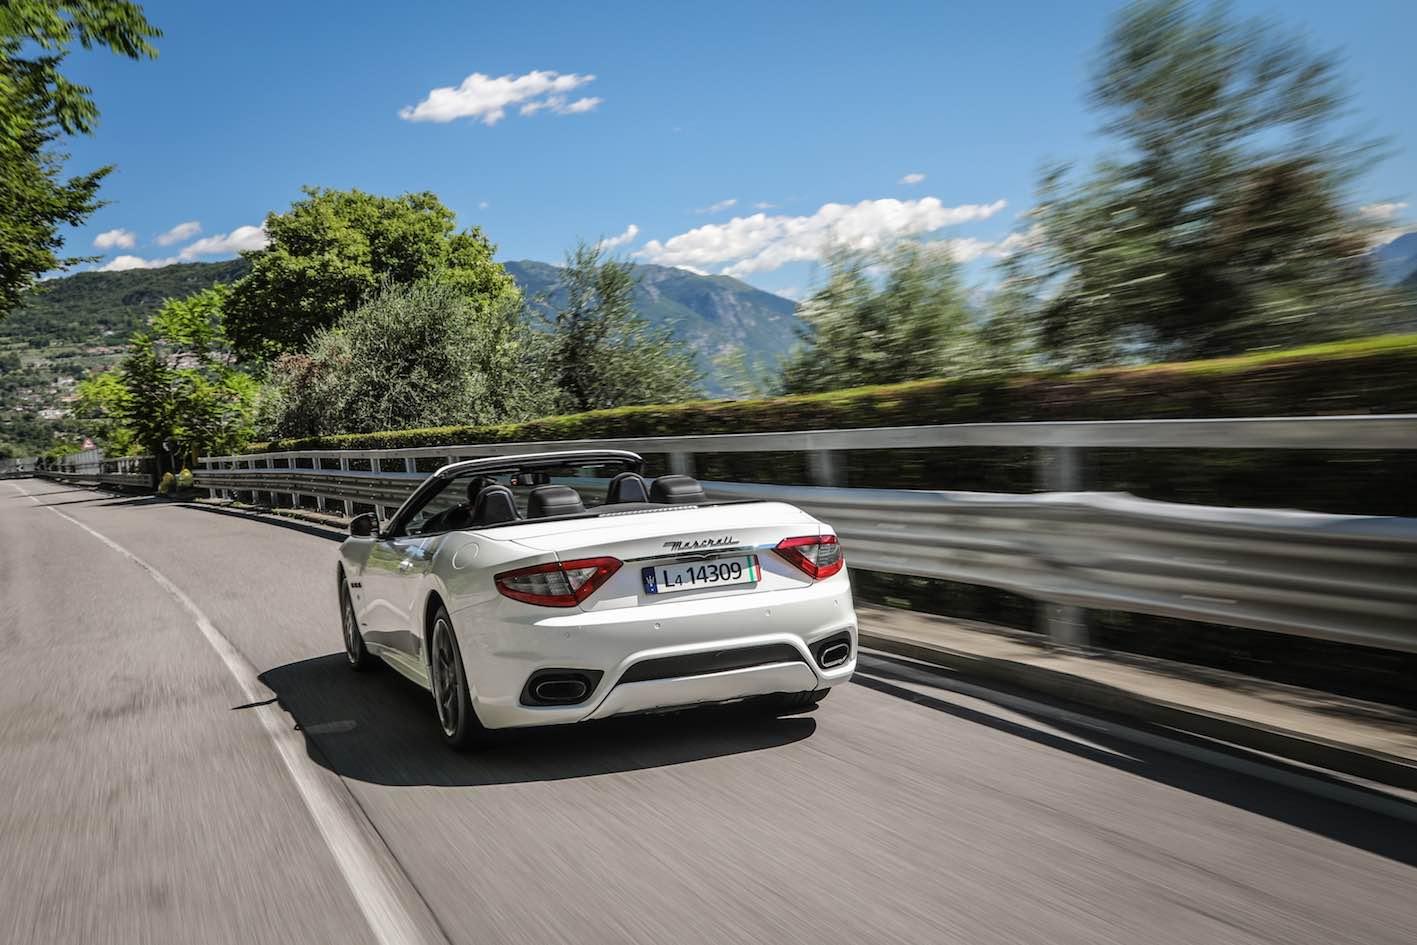 Maserati Grancabrio weiß Heck 2018